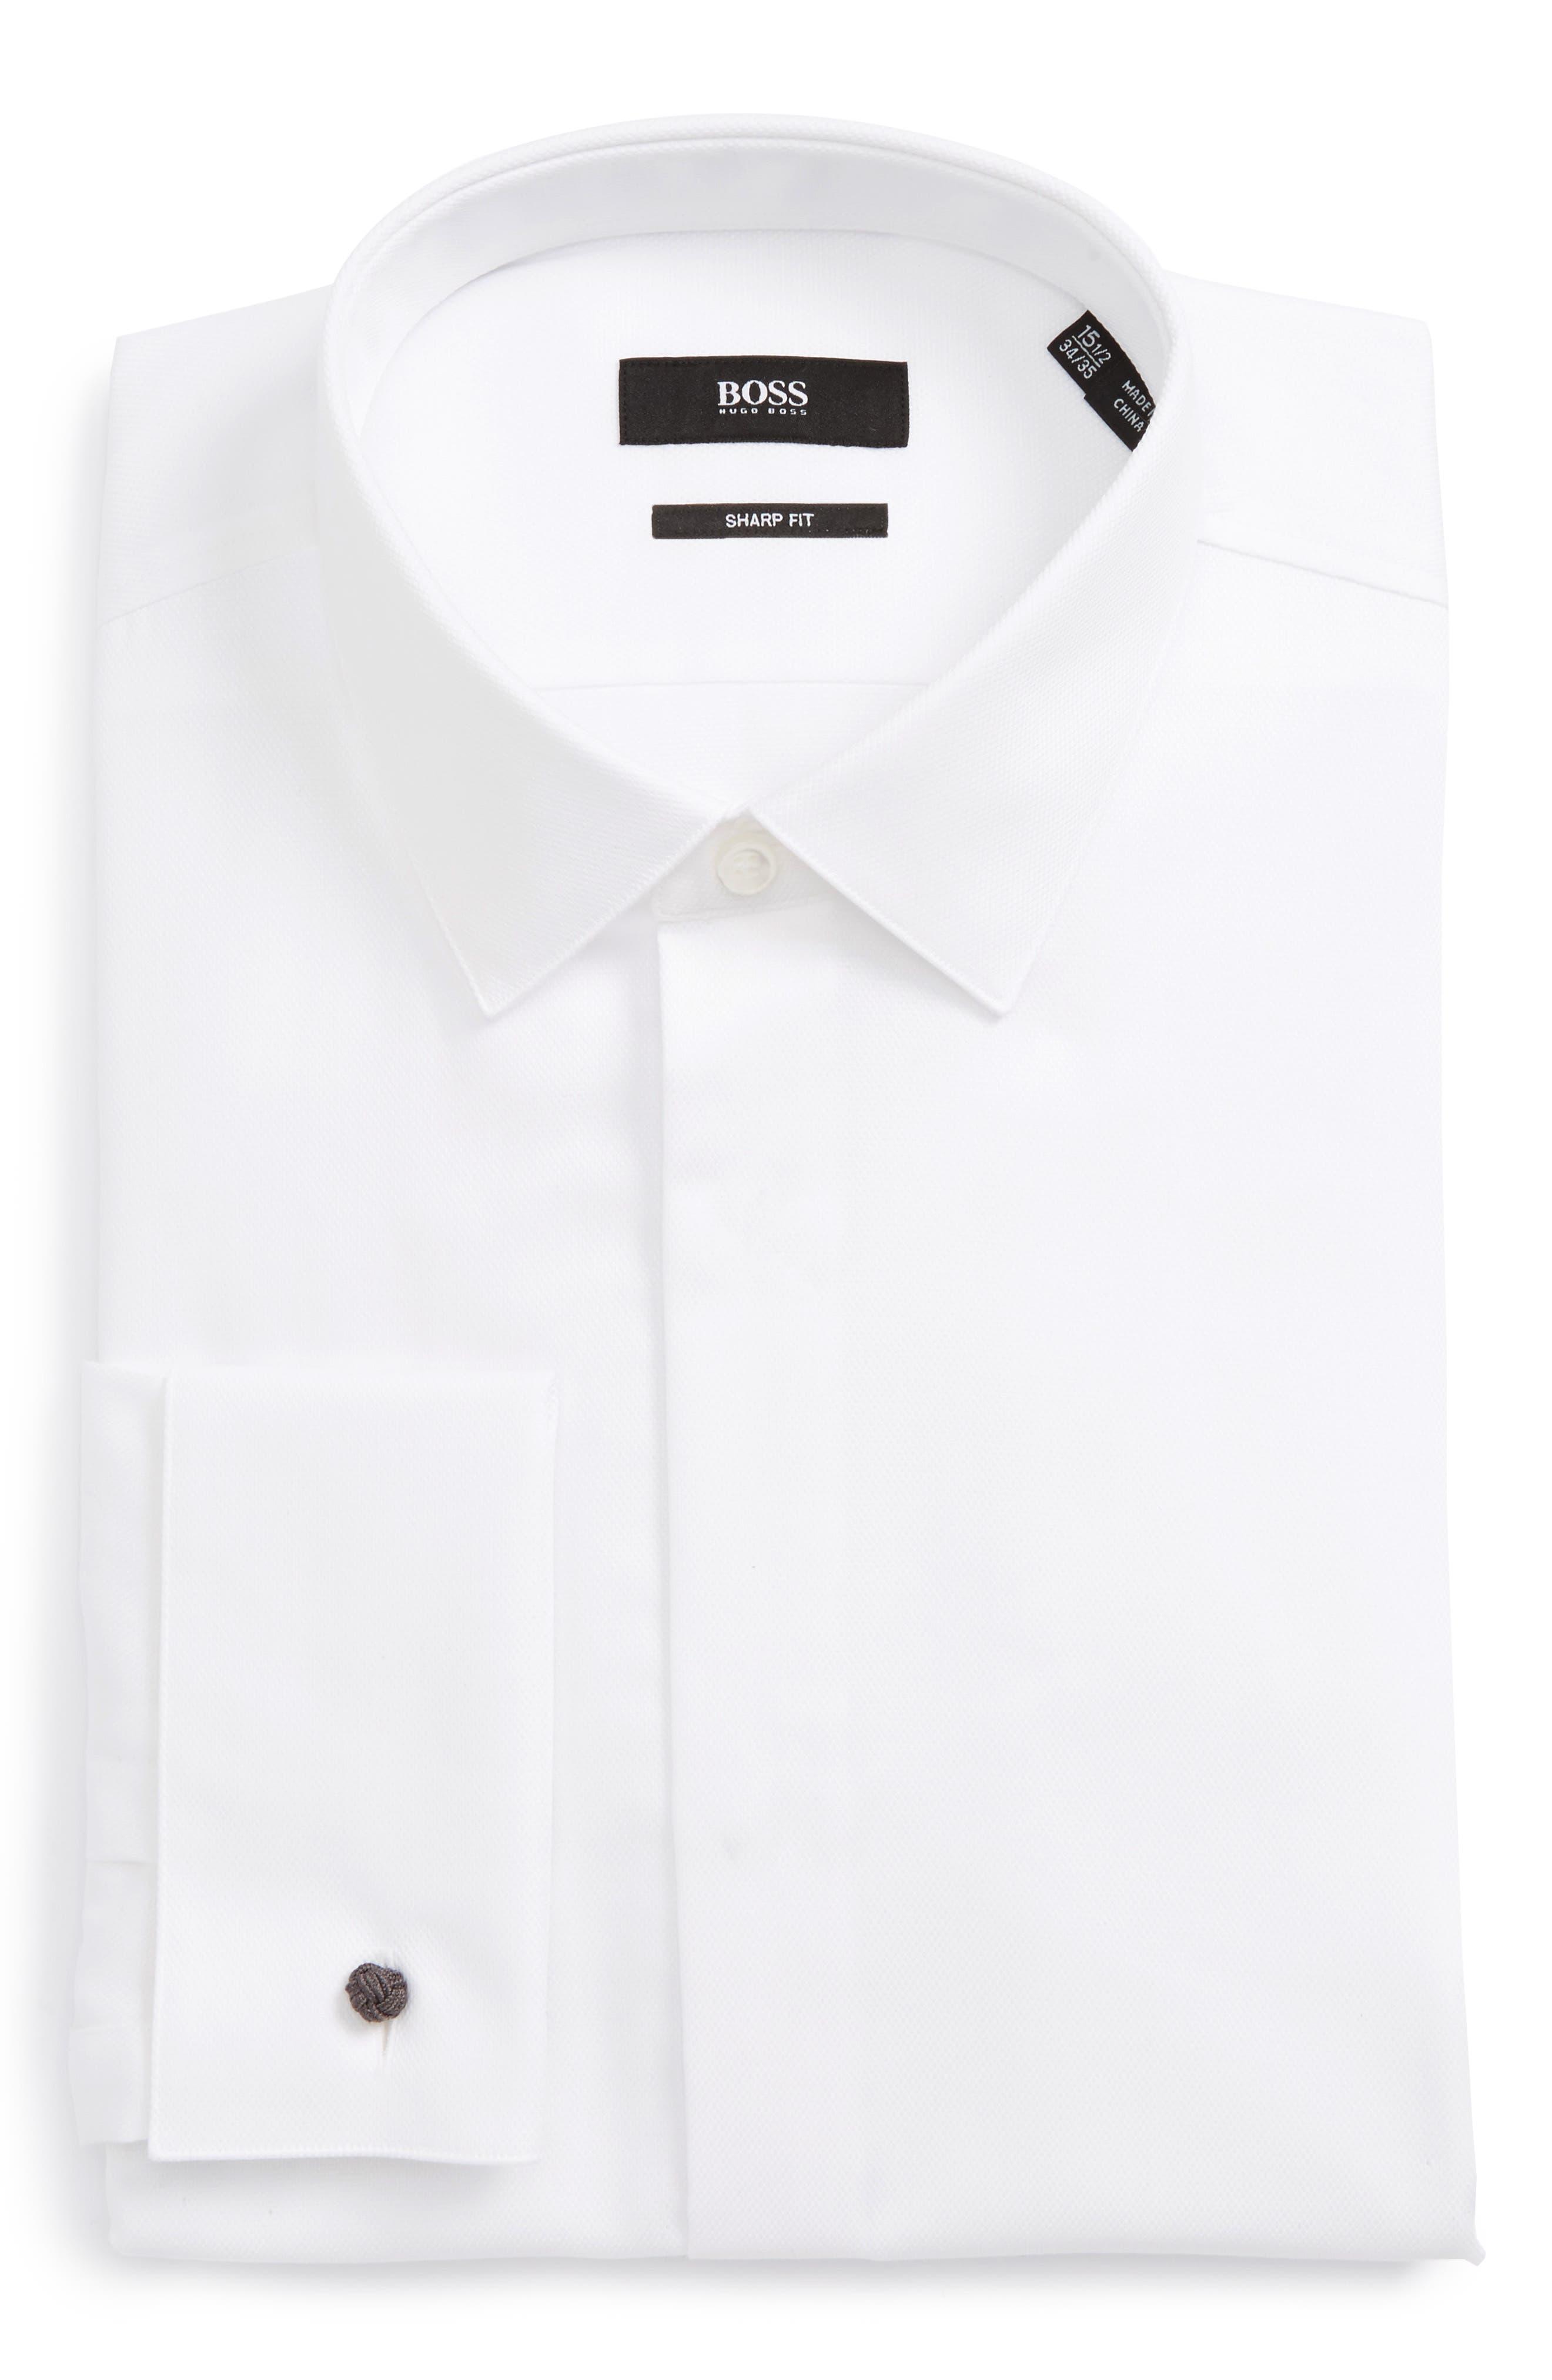 Main Image - BOSS Myron Sharp Fit Tuxedo Shirt